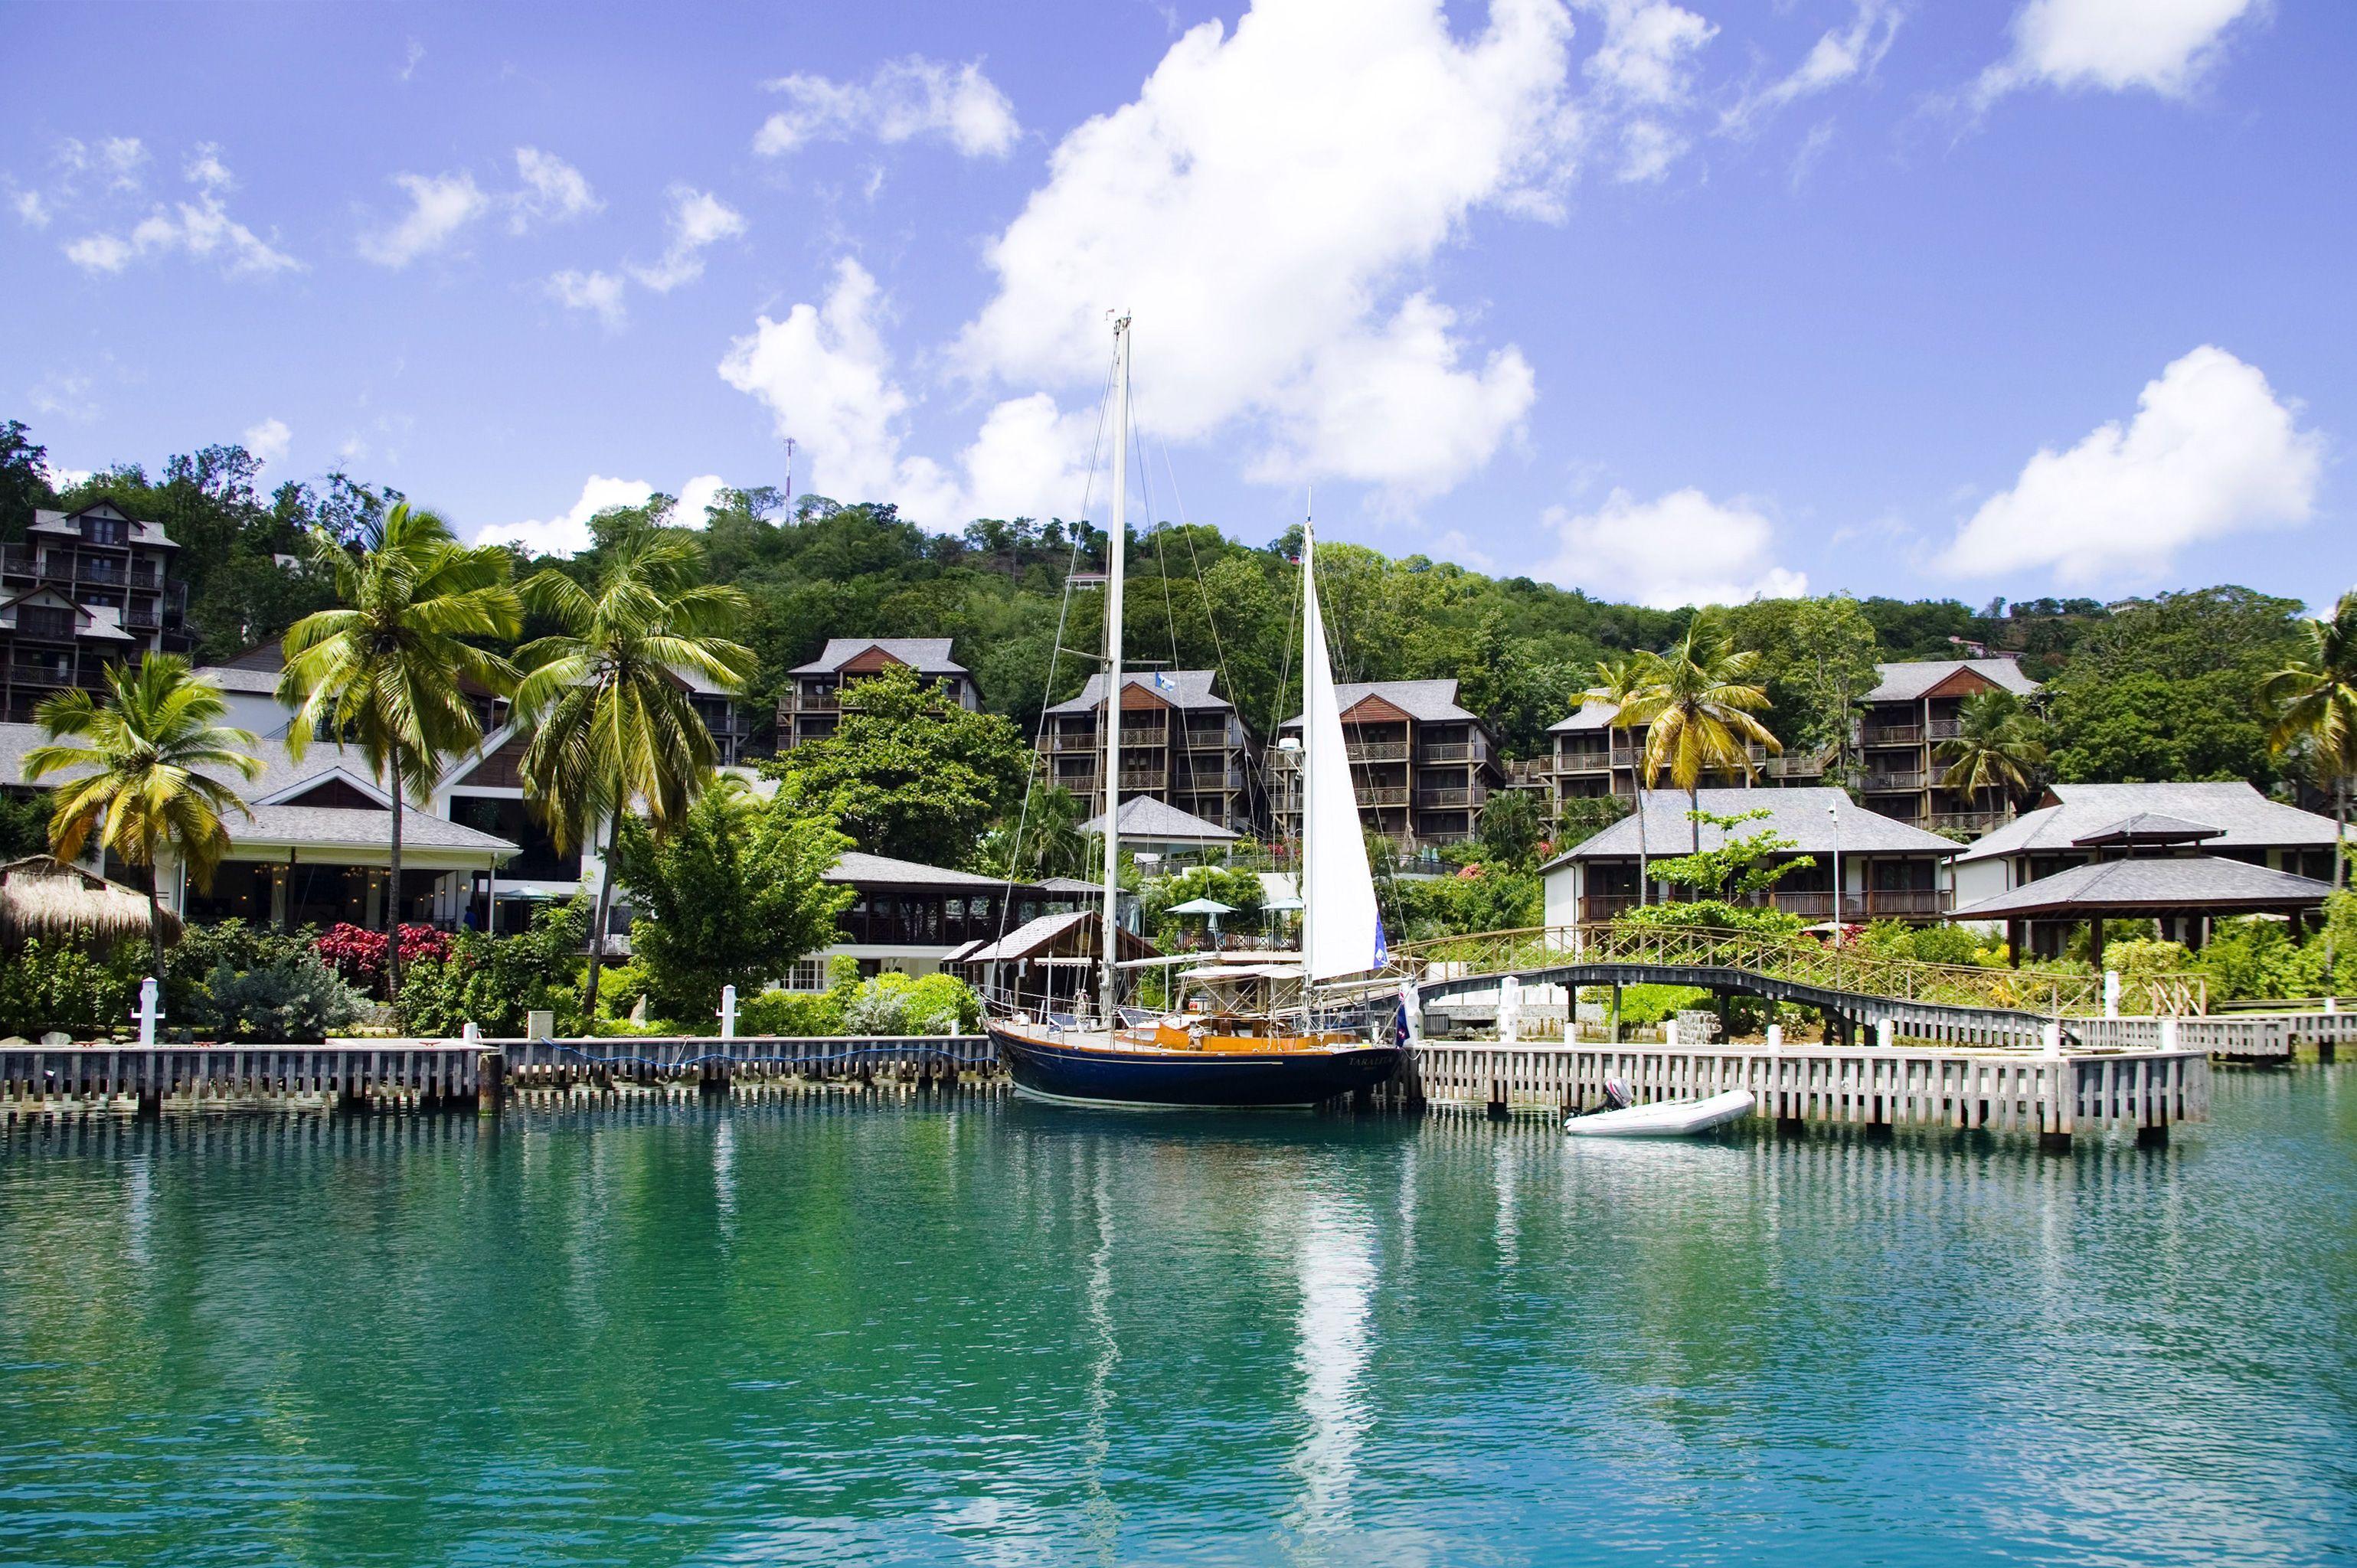 b28fb2b800ea3d75e8ac685eece66a97 - Tripadvisor Bay Gardens Beach Resort St Lucia